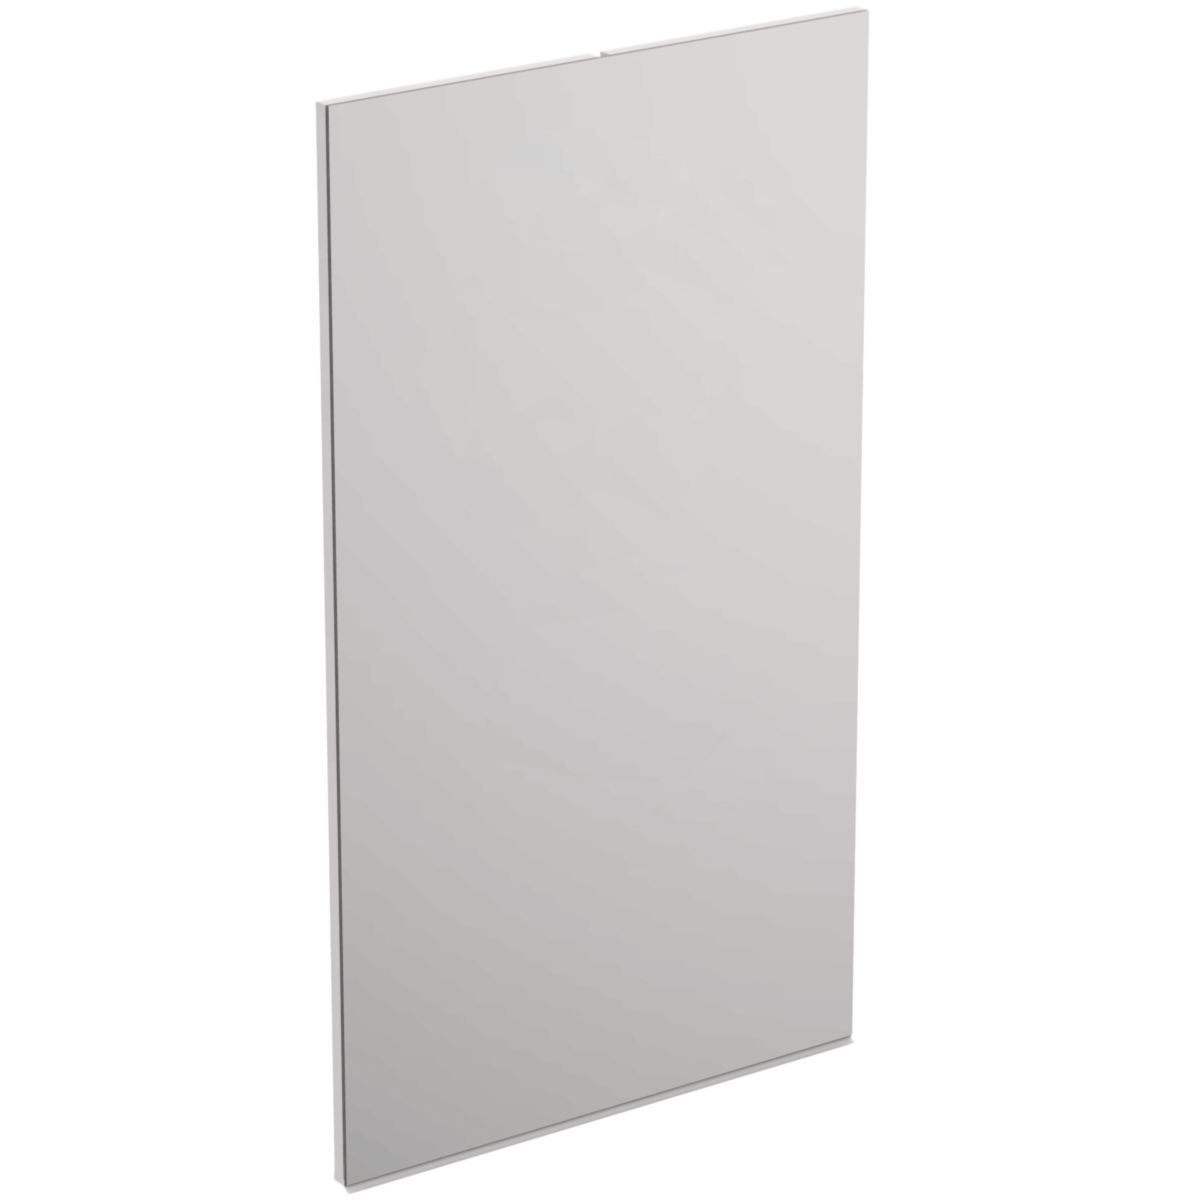 Salle De Bain Zen Bambou ~ Miroir Ulysse 60 X 105 Cm R F E3229bh Ideal Standard Sanitaire